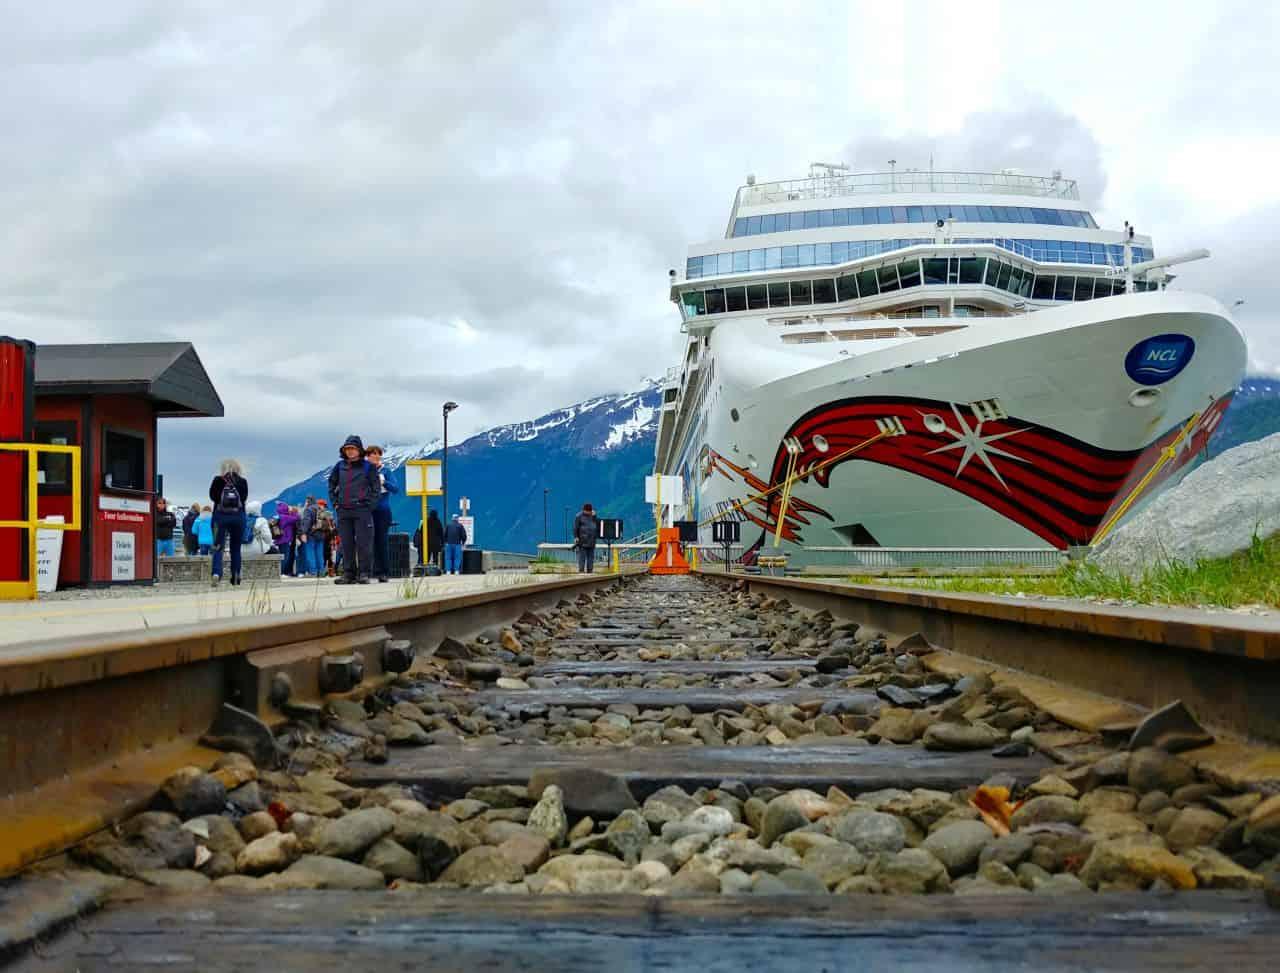 norwegian jewel cruise ship train tracks in skagway alaska v2